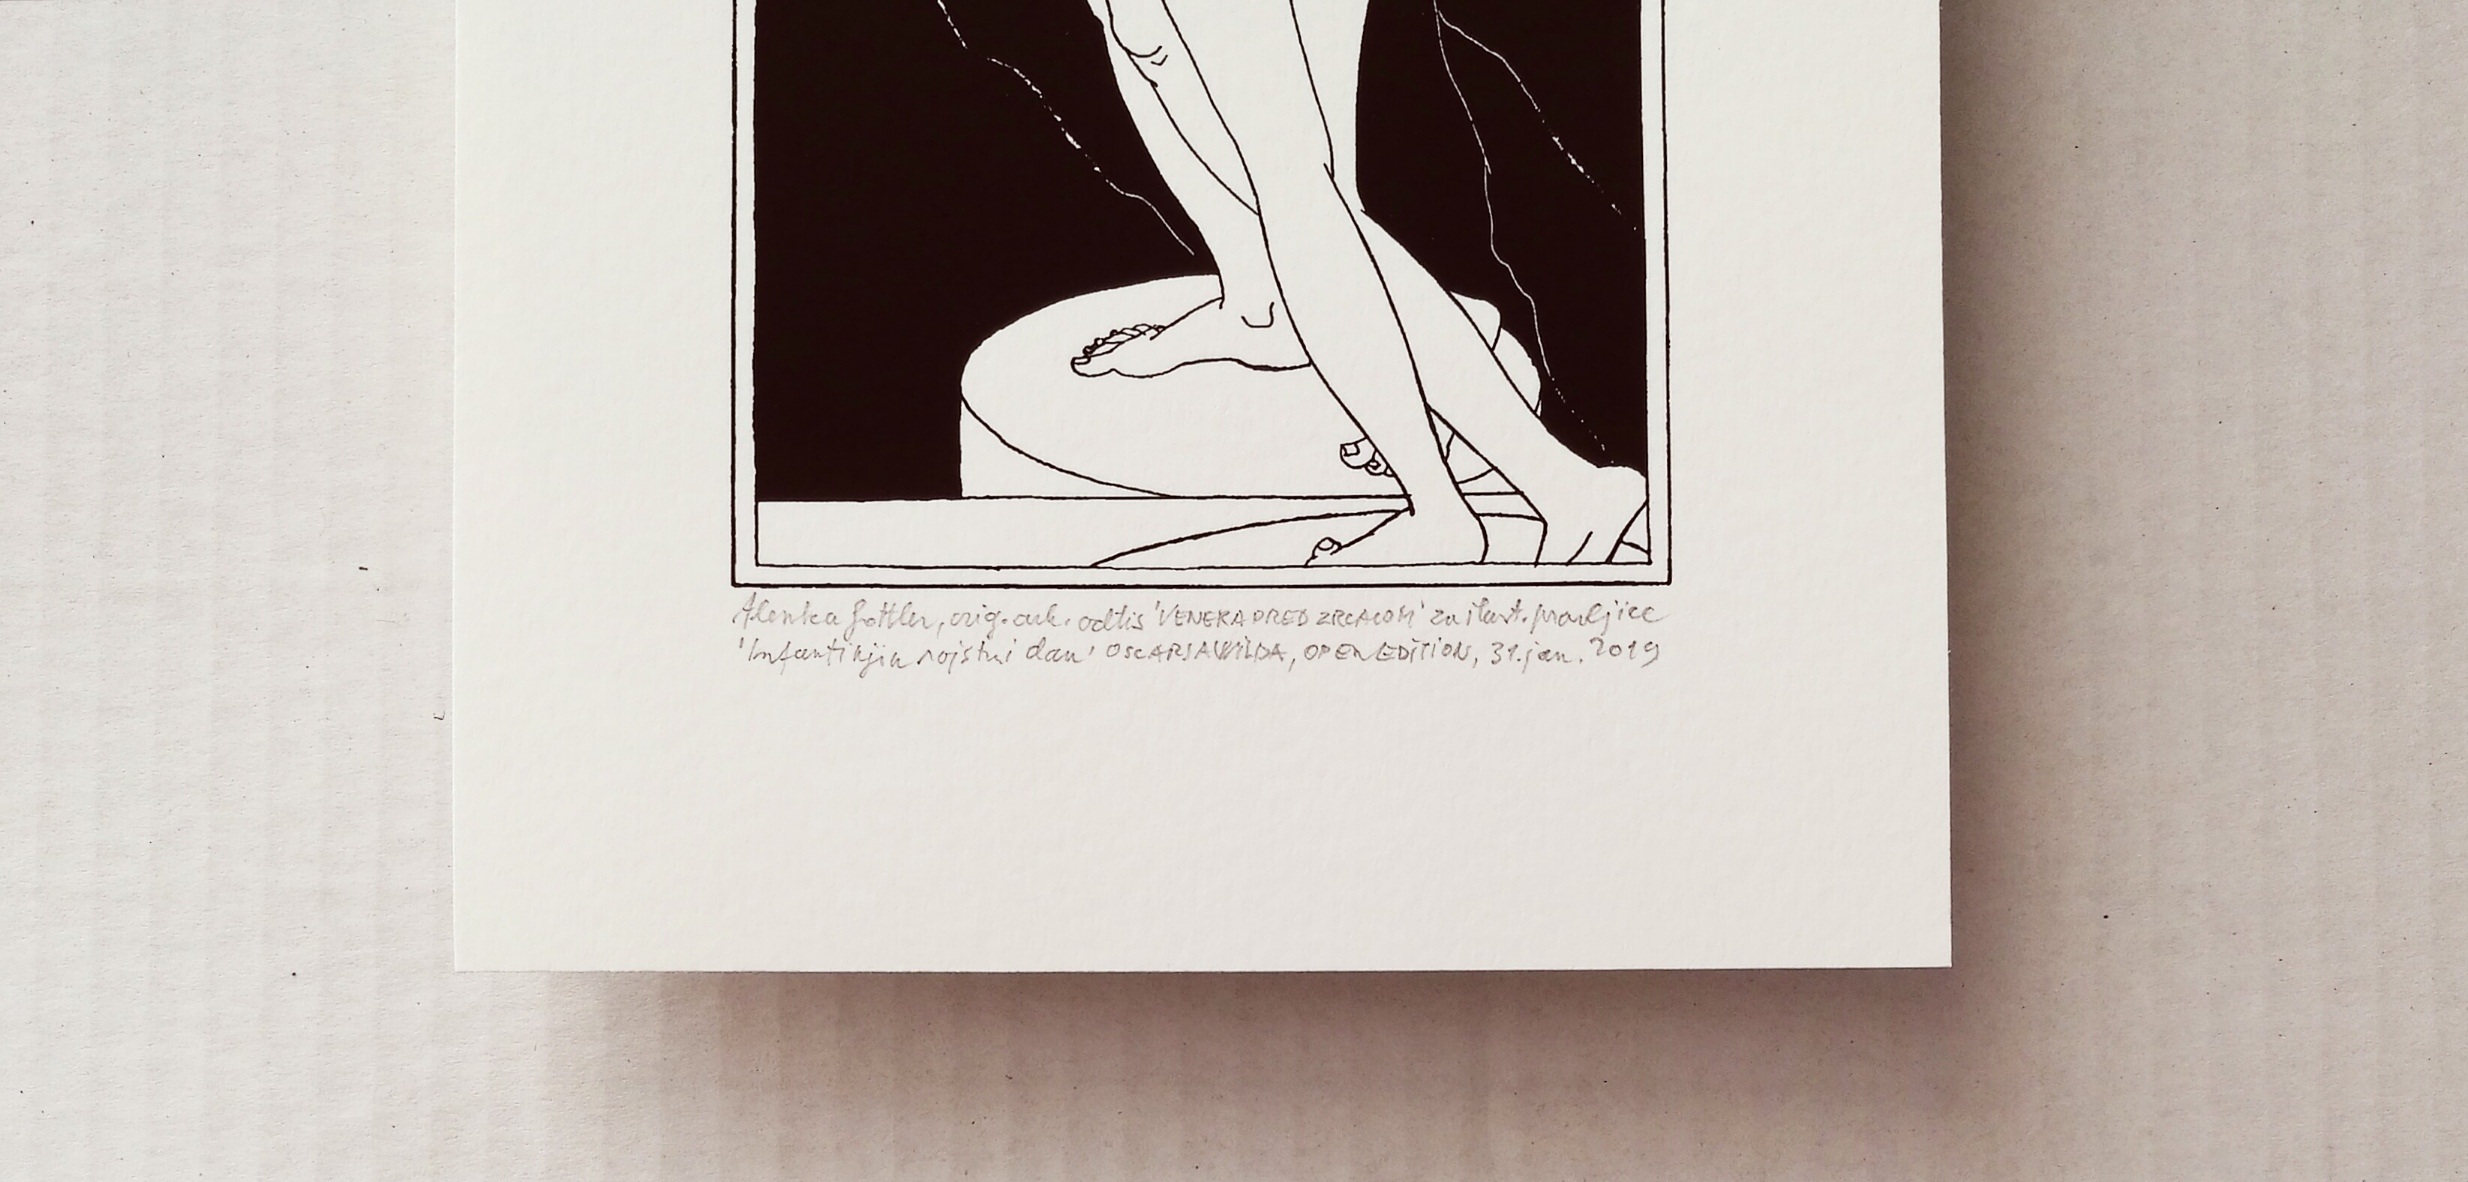 Venus in the mirror